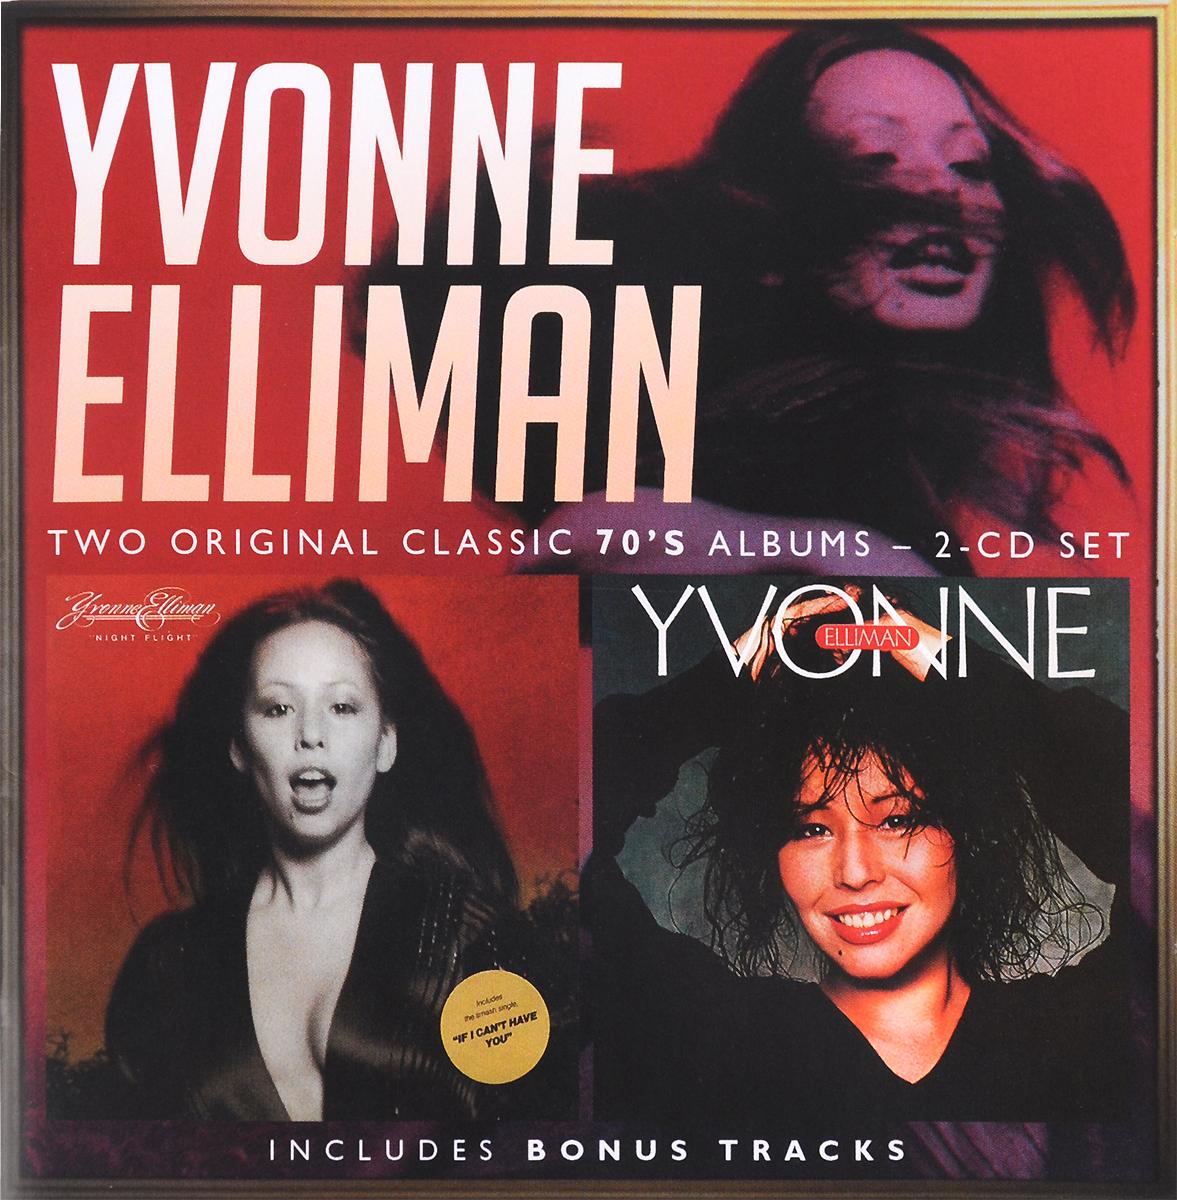 Ивонн Эллиман Yvonne Elliman. Night Flight / Yvonne (2 CD) audia flight cd three silver